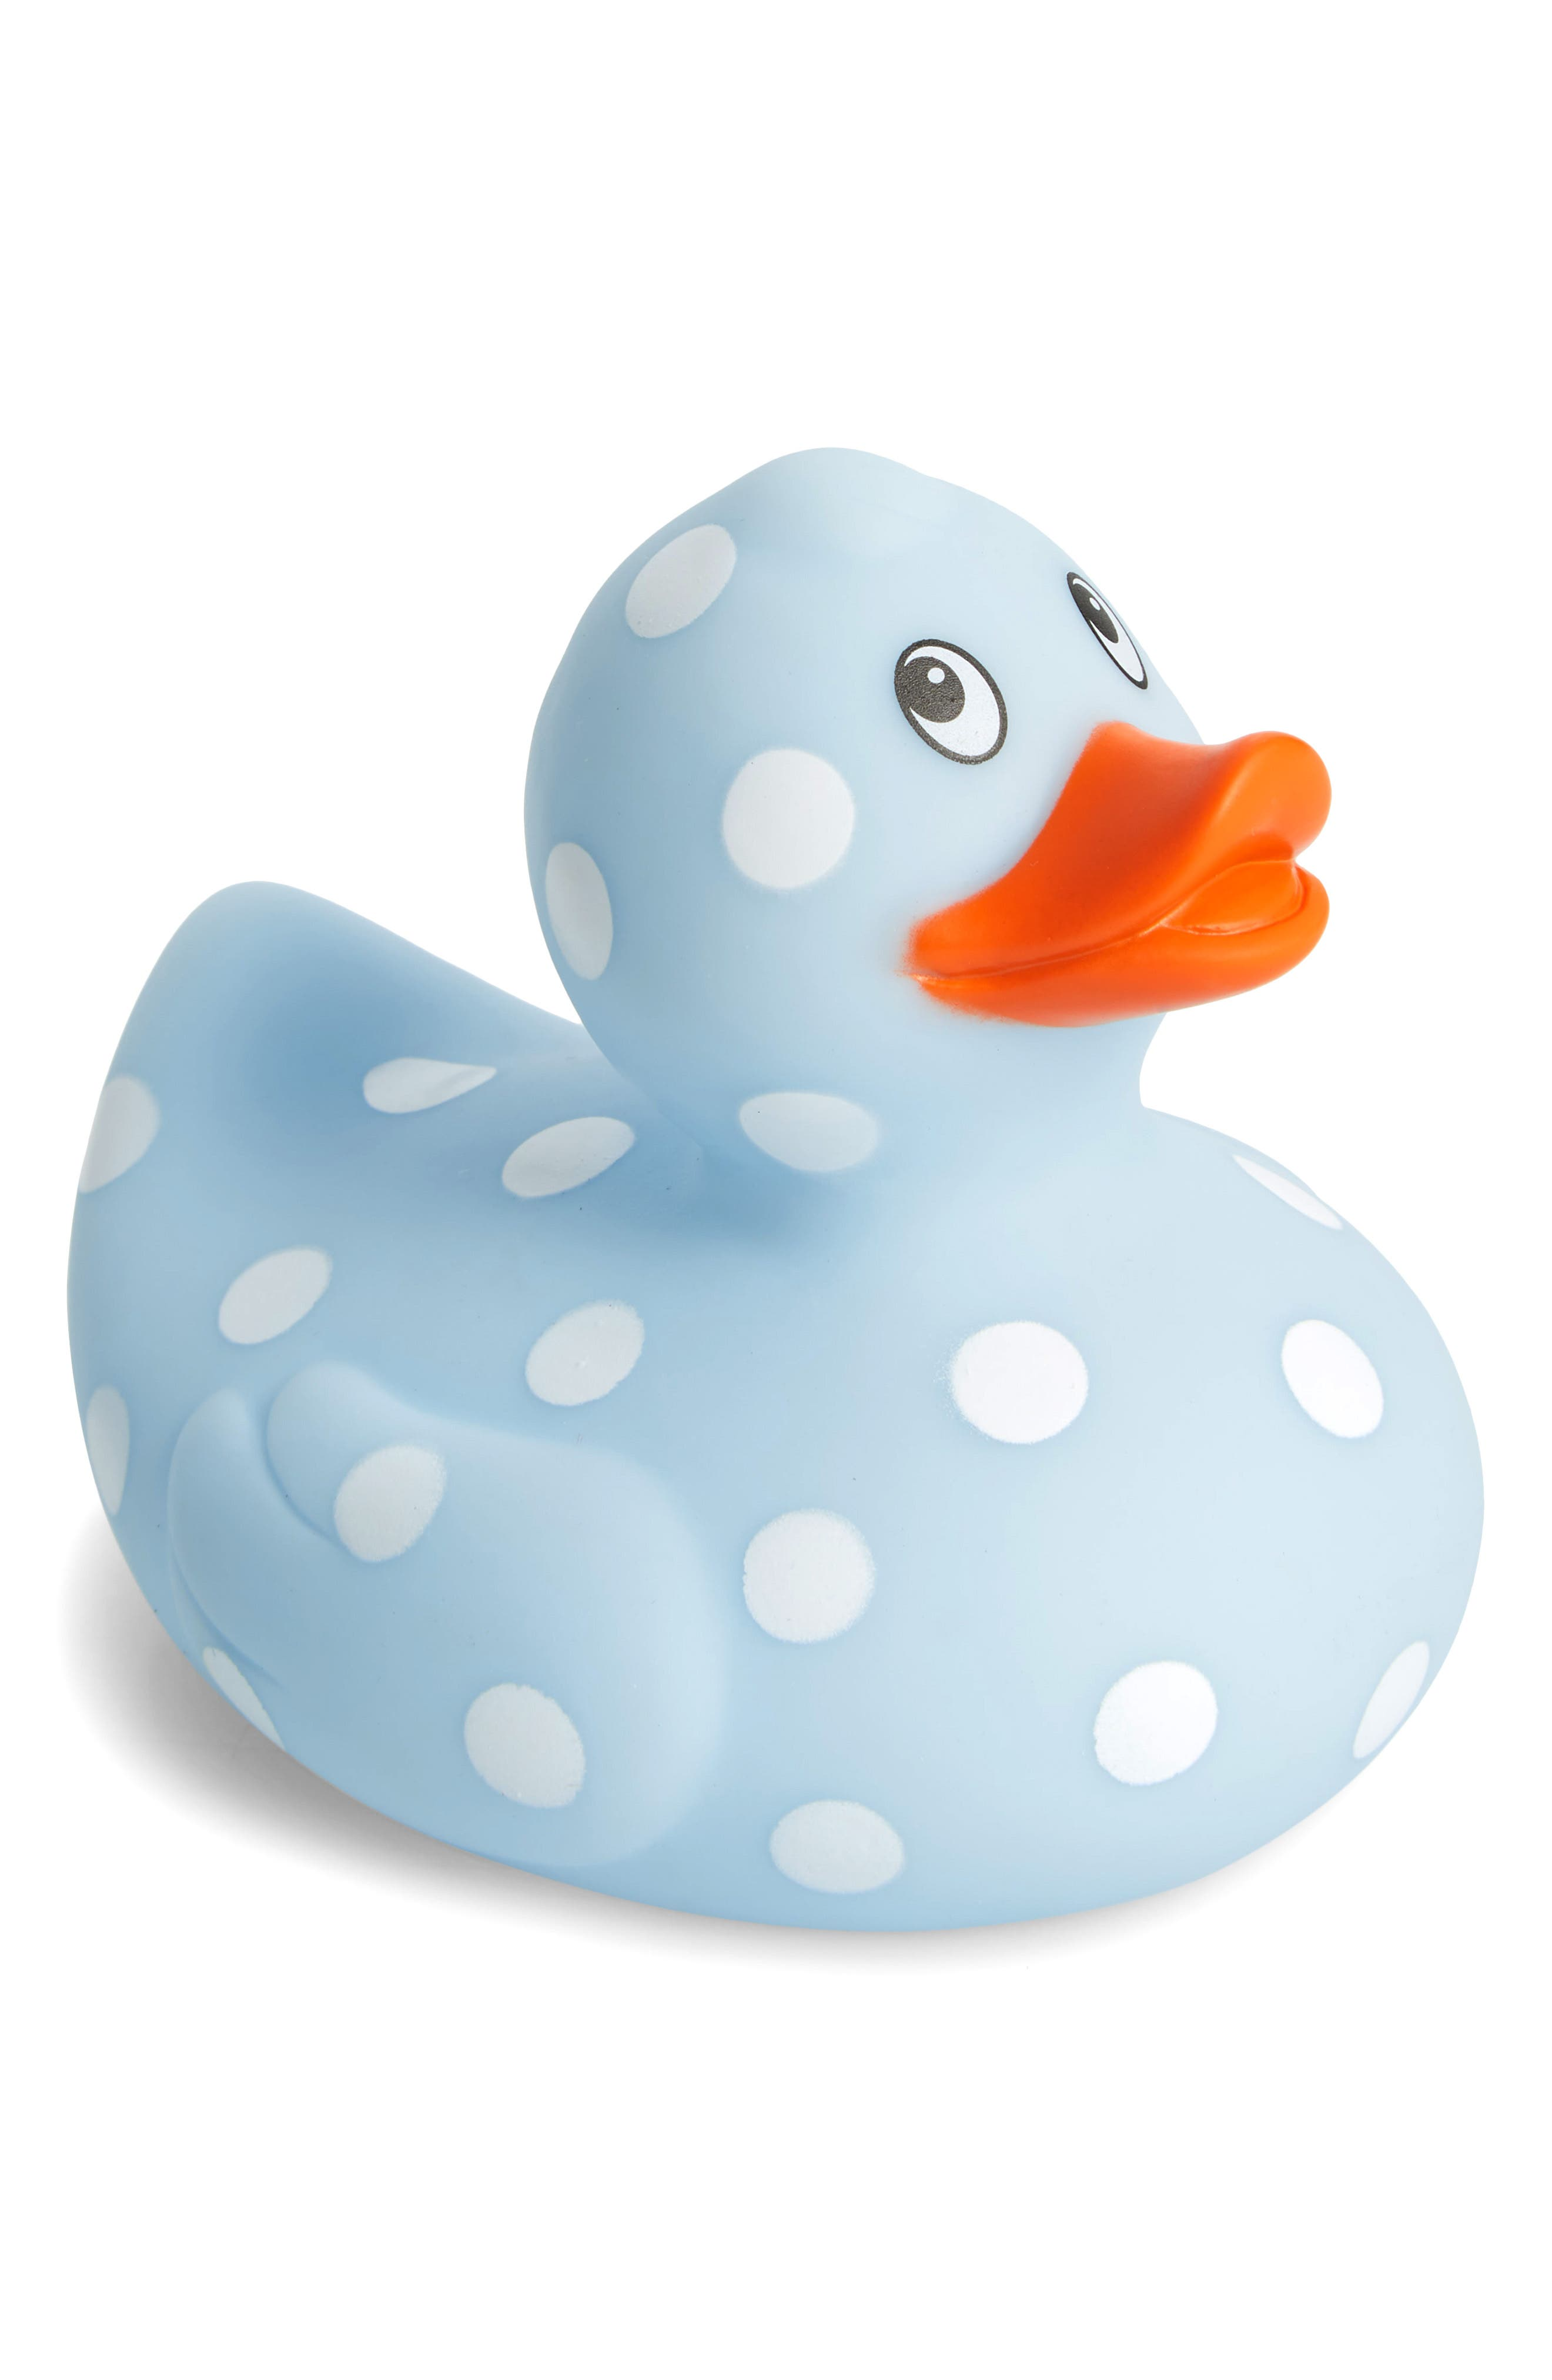 Blue Polka Dot Rubber Duck Bath Toy,                         Main,                         color, Light Blue